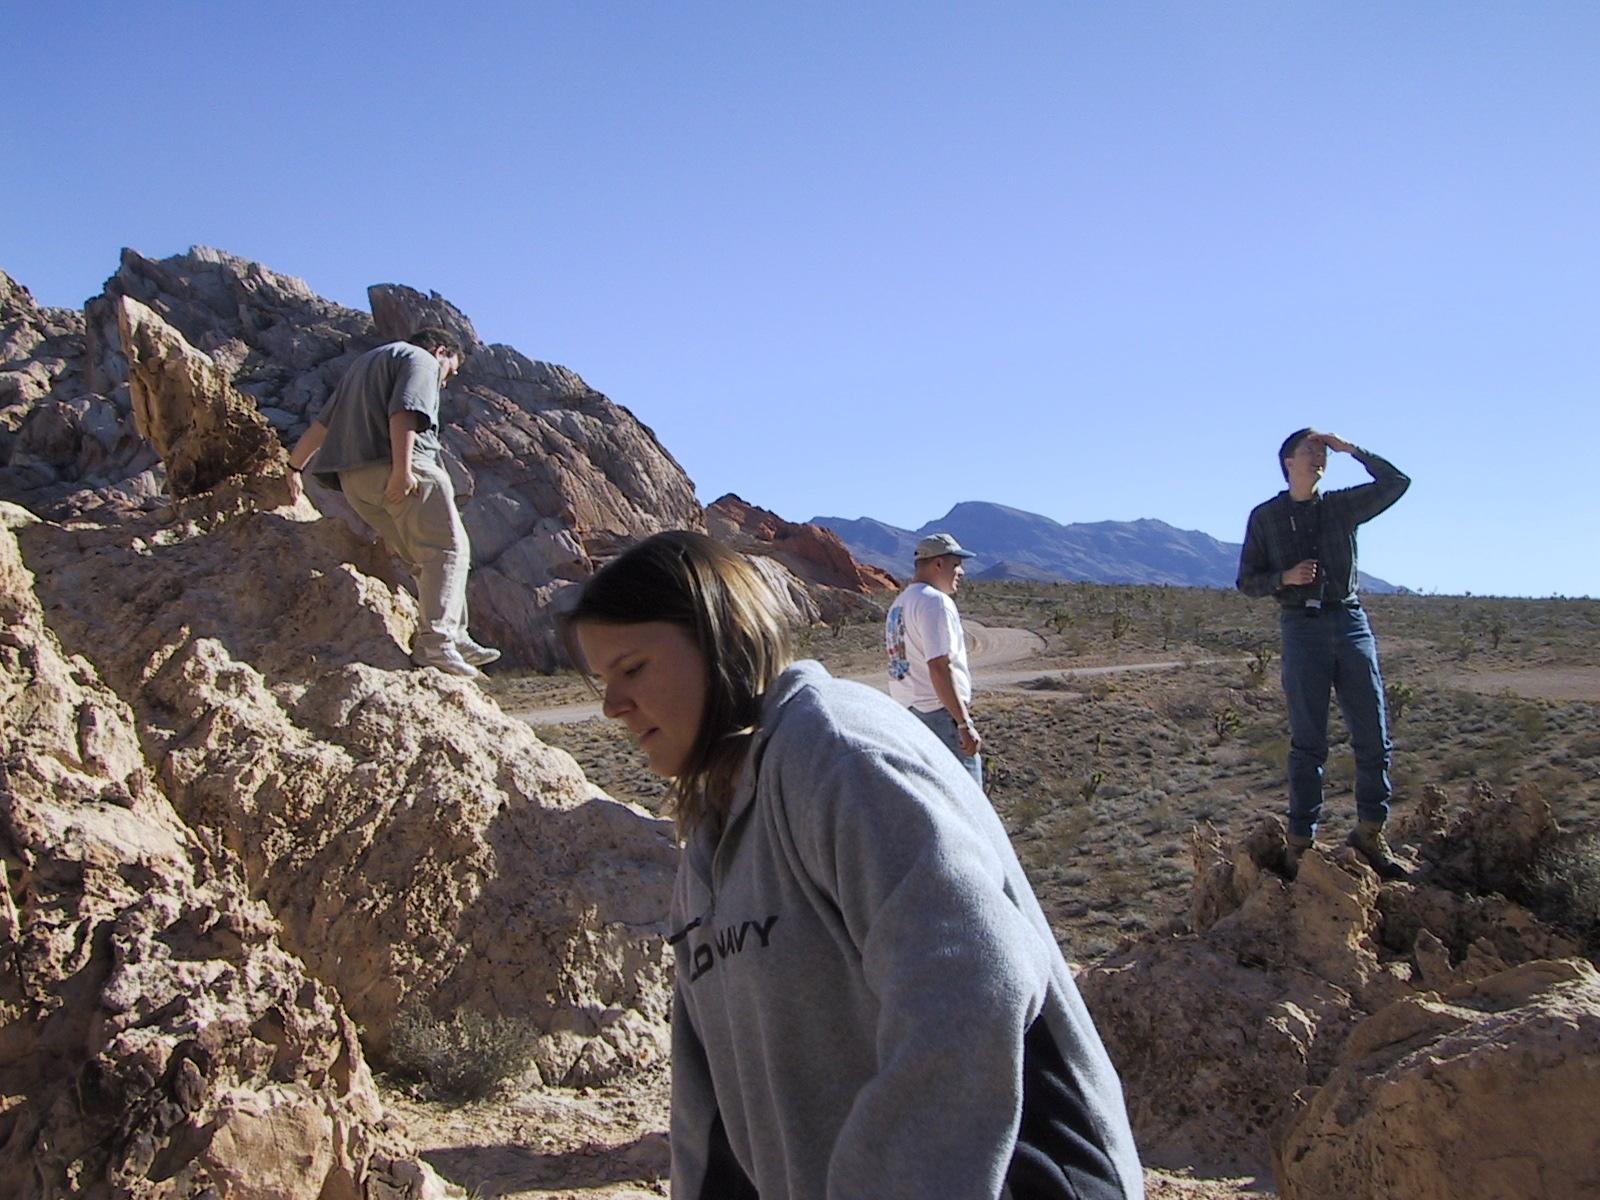 Scrambling over the rocks